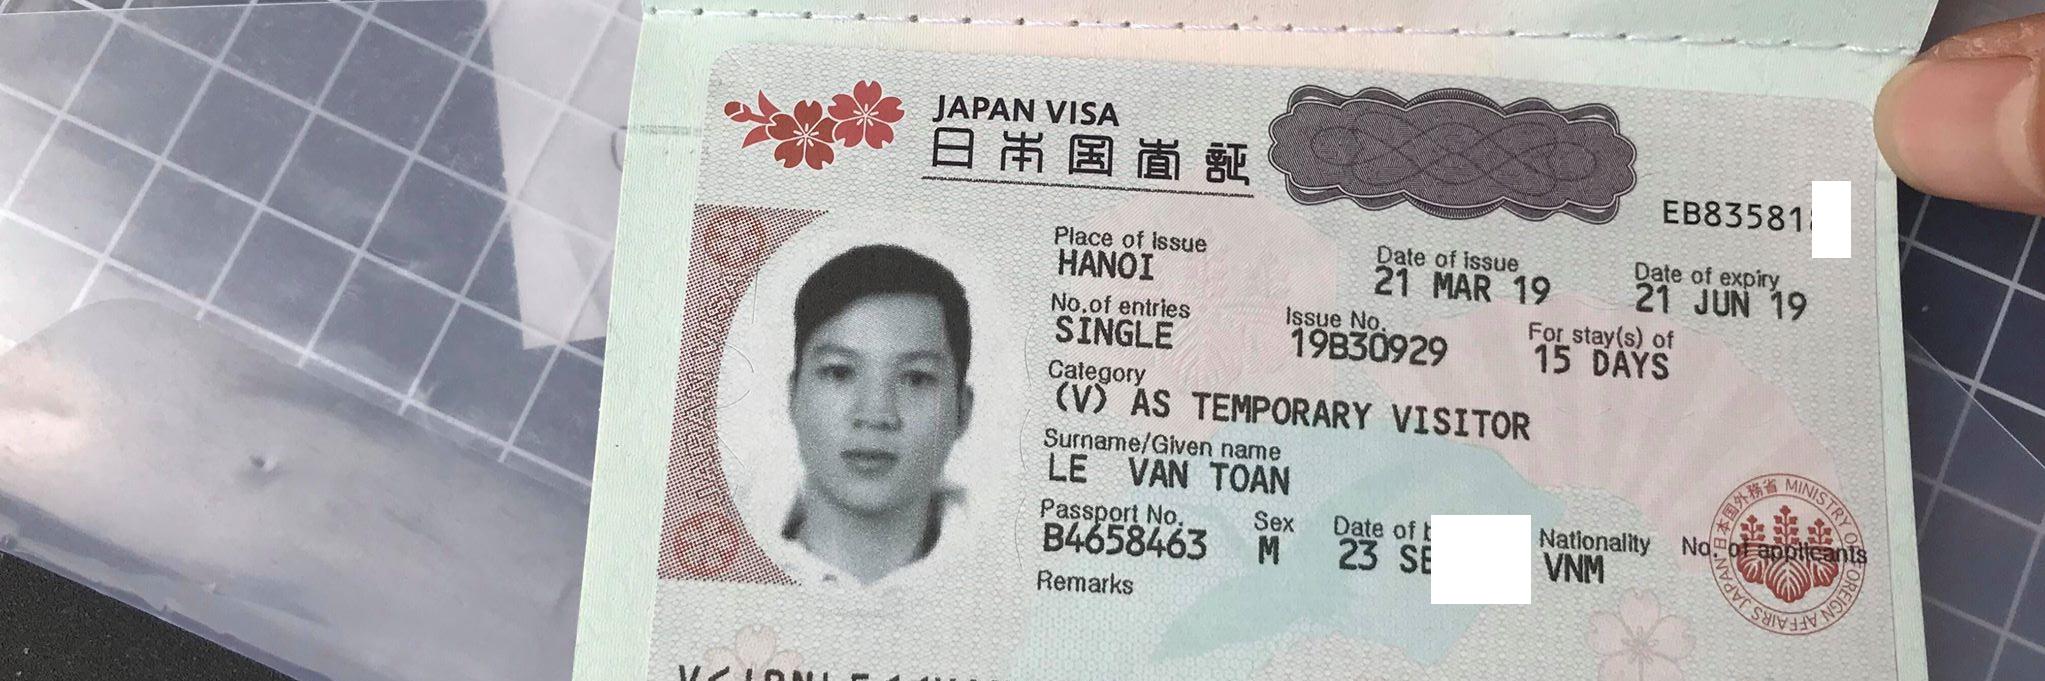 https://gody.vn/blog/charrly.le6705/post/cac-nuoc-mien-visa-cho-nguoi-viet-nam-den-du-lich-ngan-ngay-5983